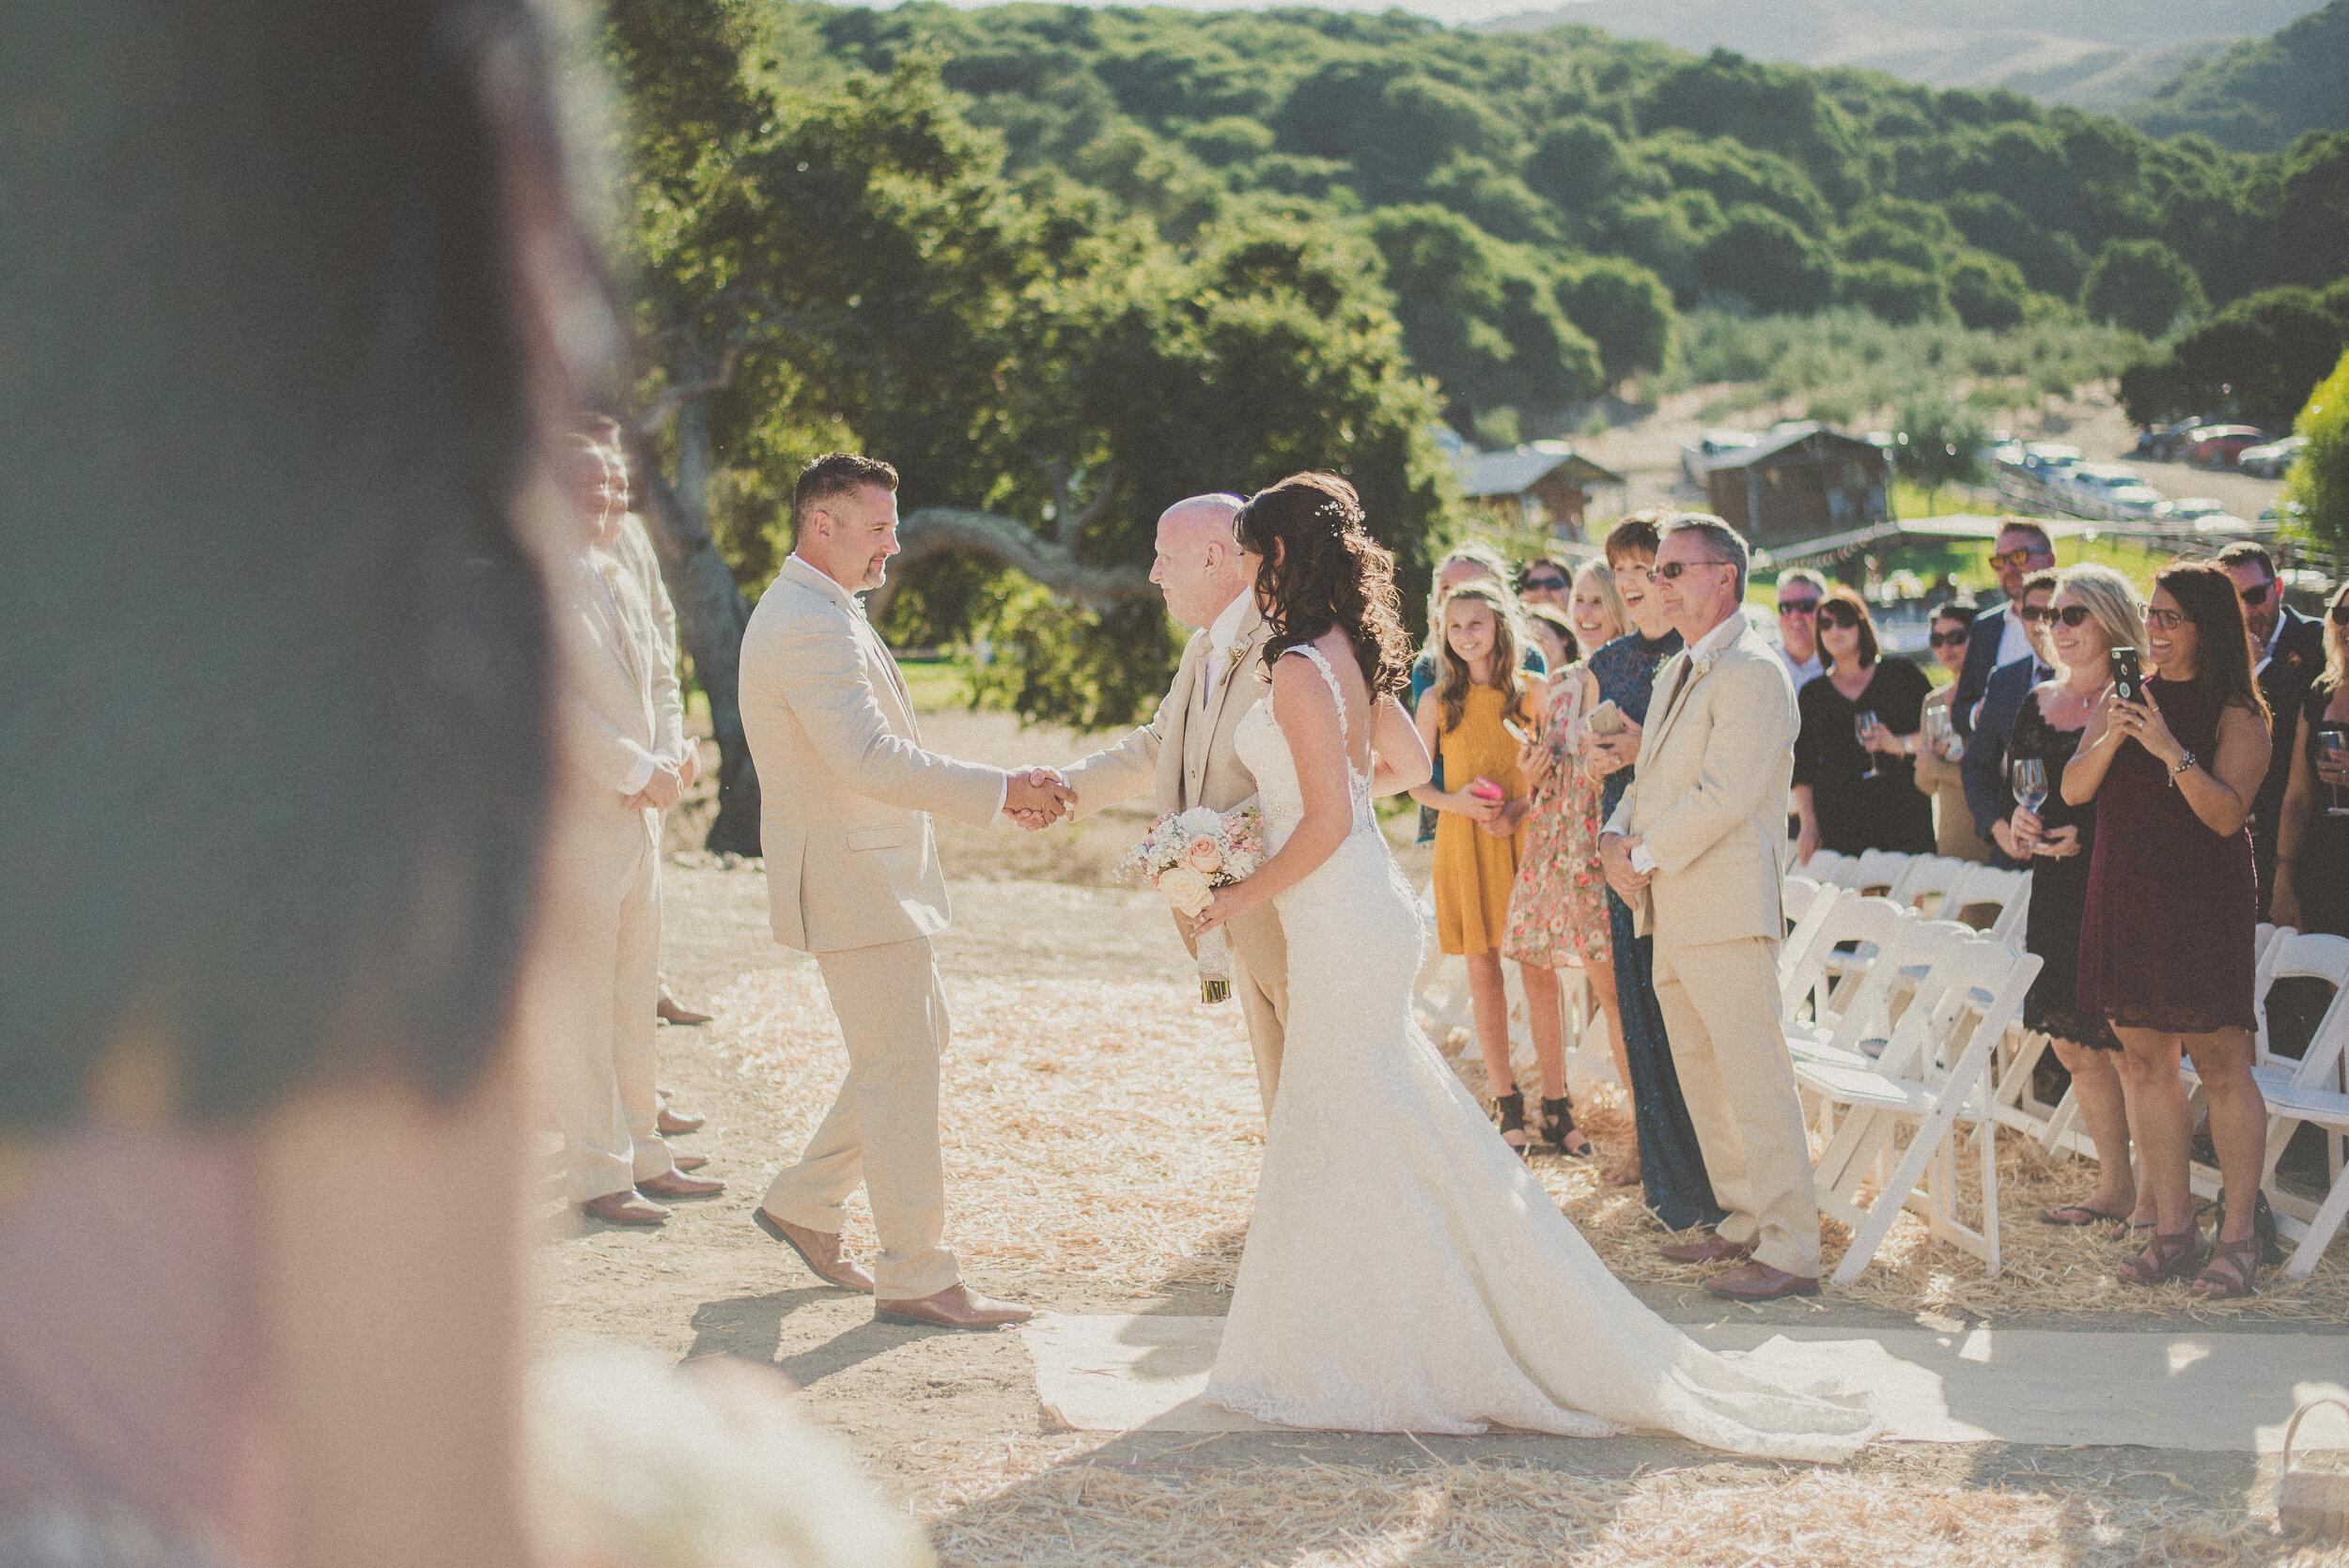 Roberts Wedding - Ceremony-63.jpg